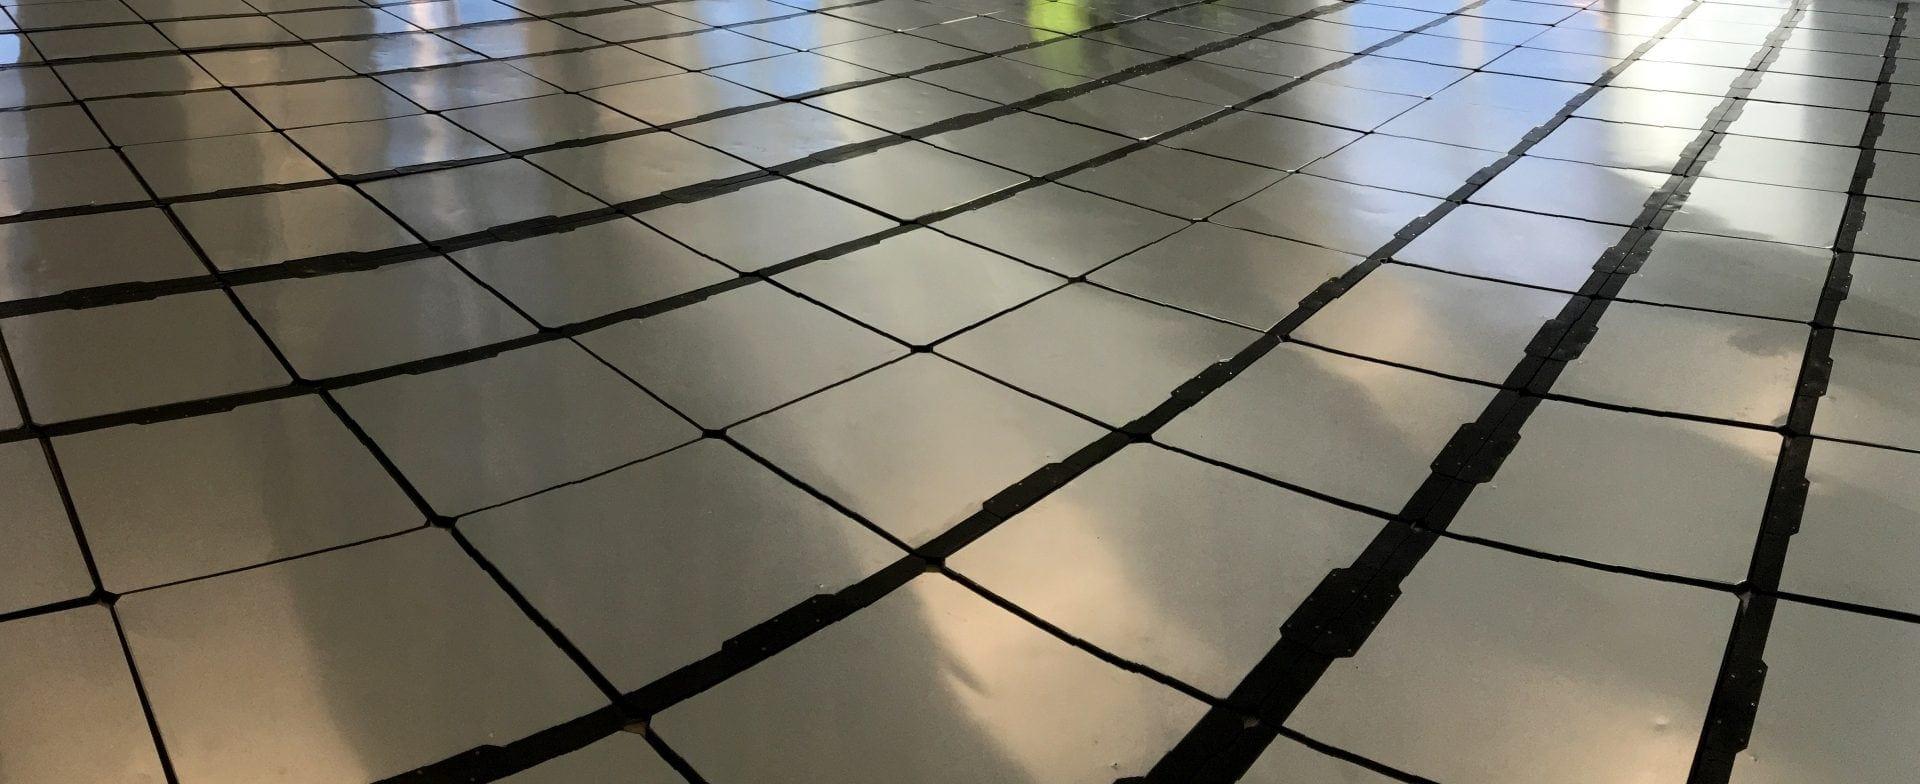 smart heating tiles plactherm